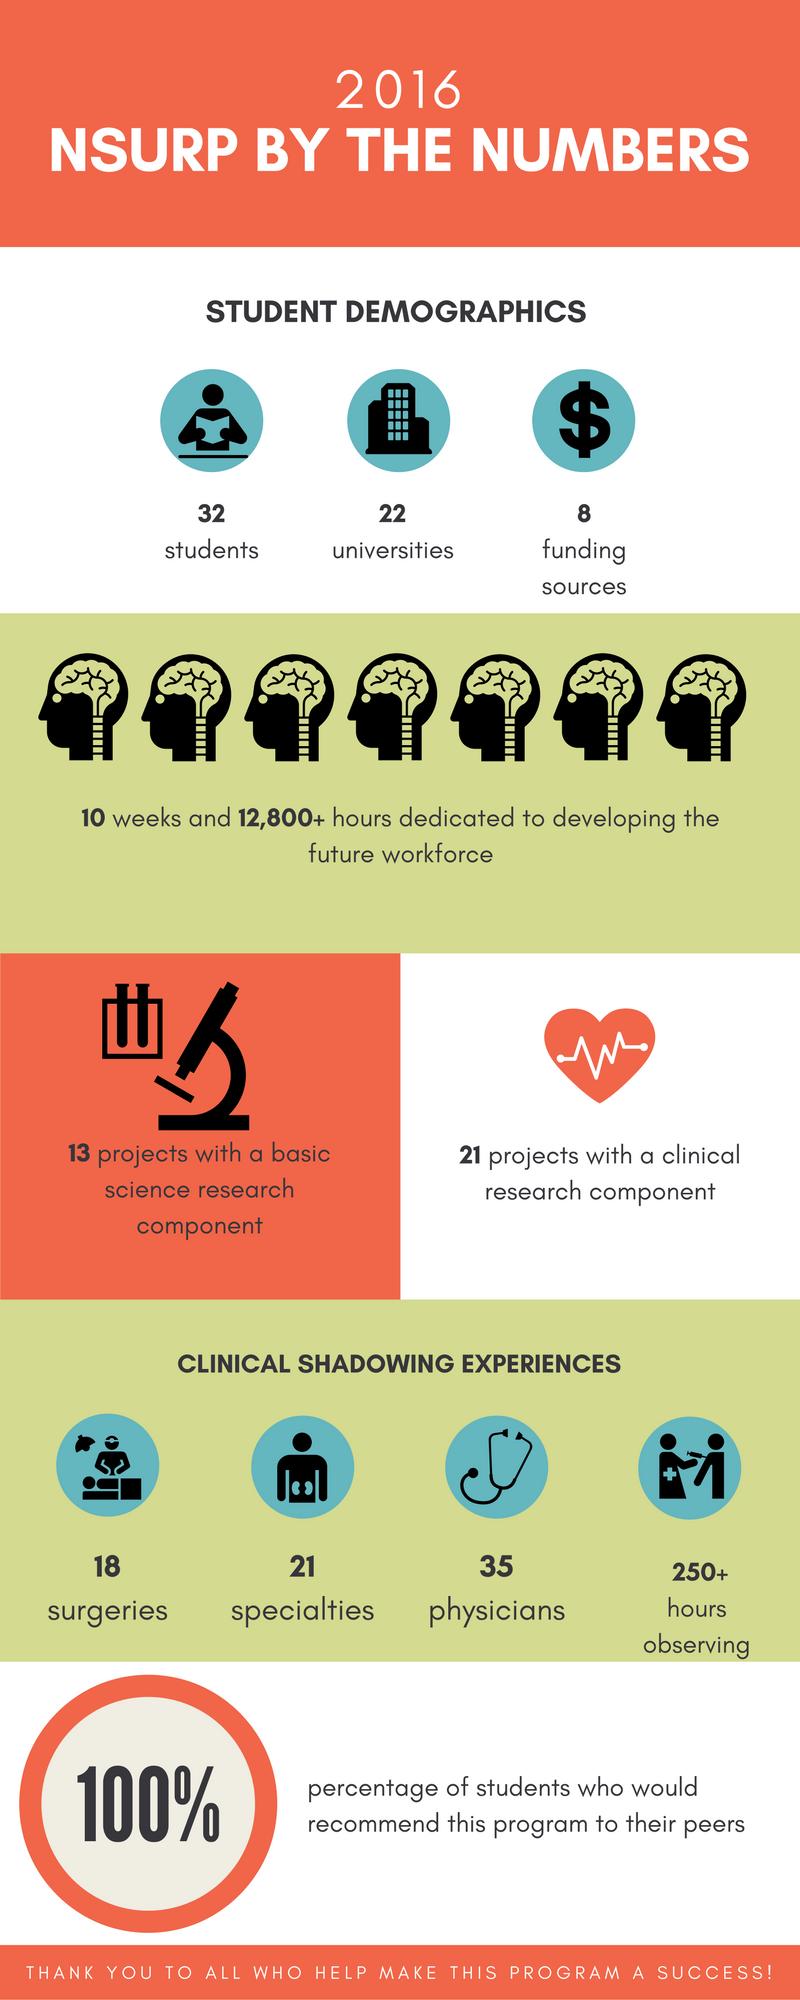 Undergraduate Research Program Infographic